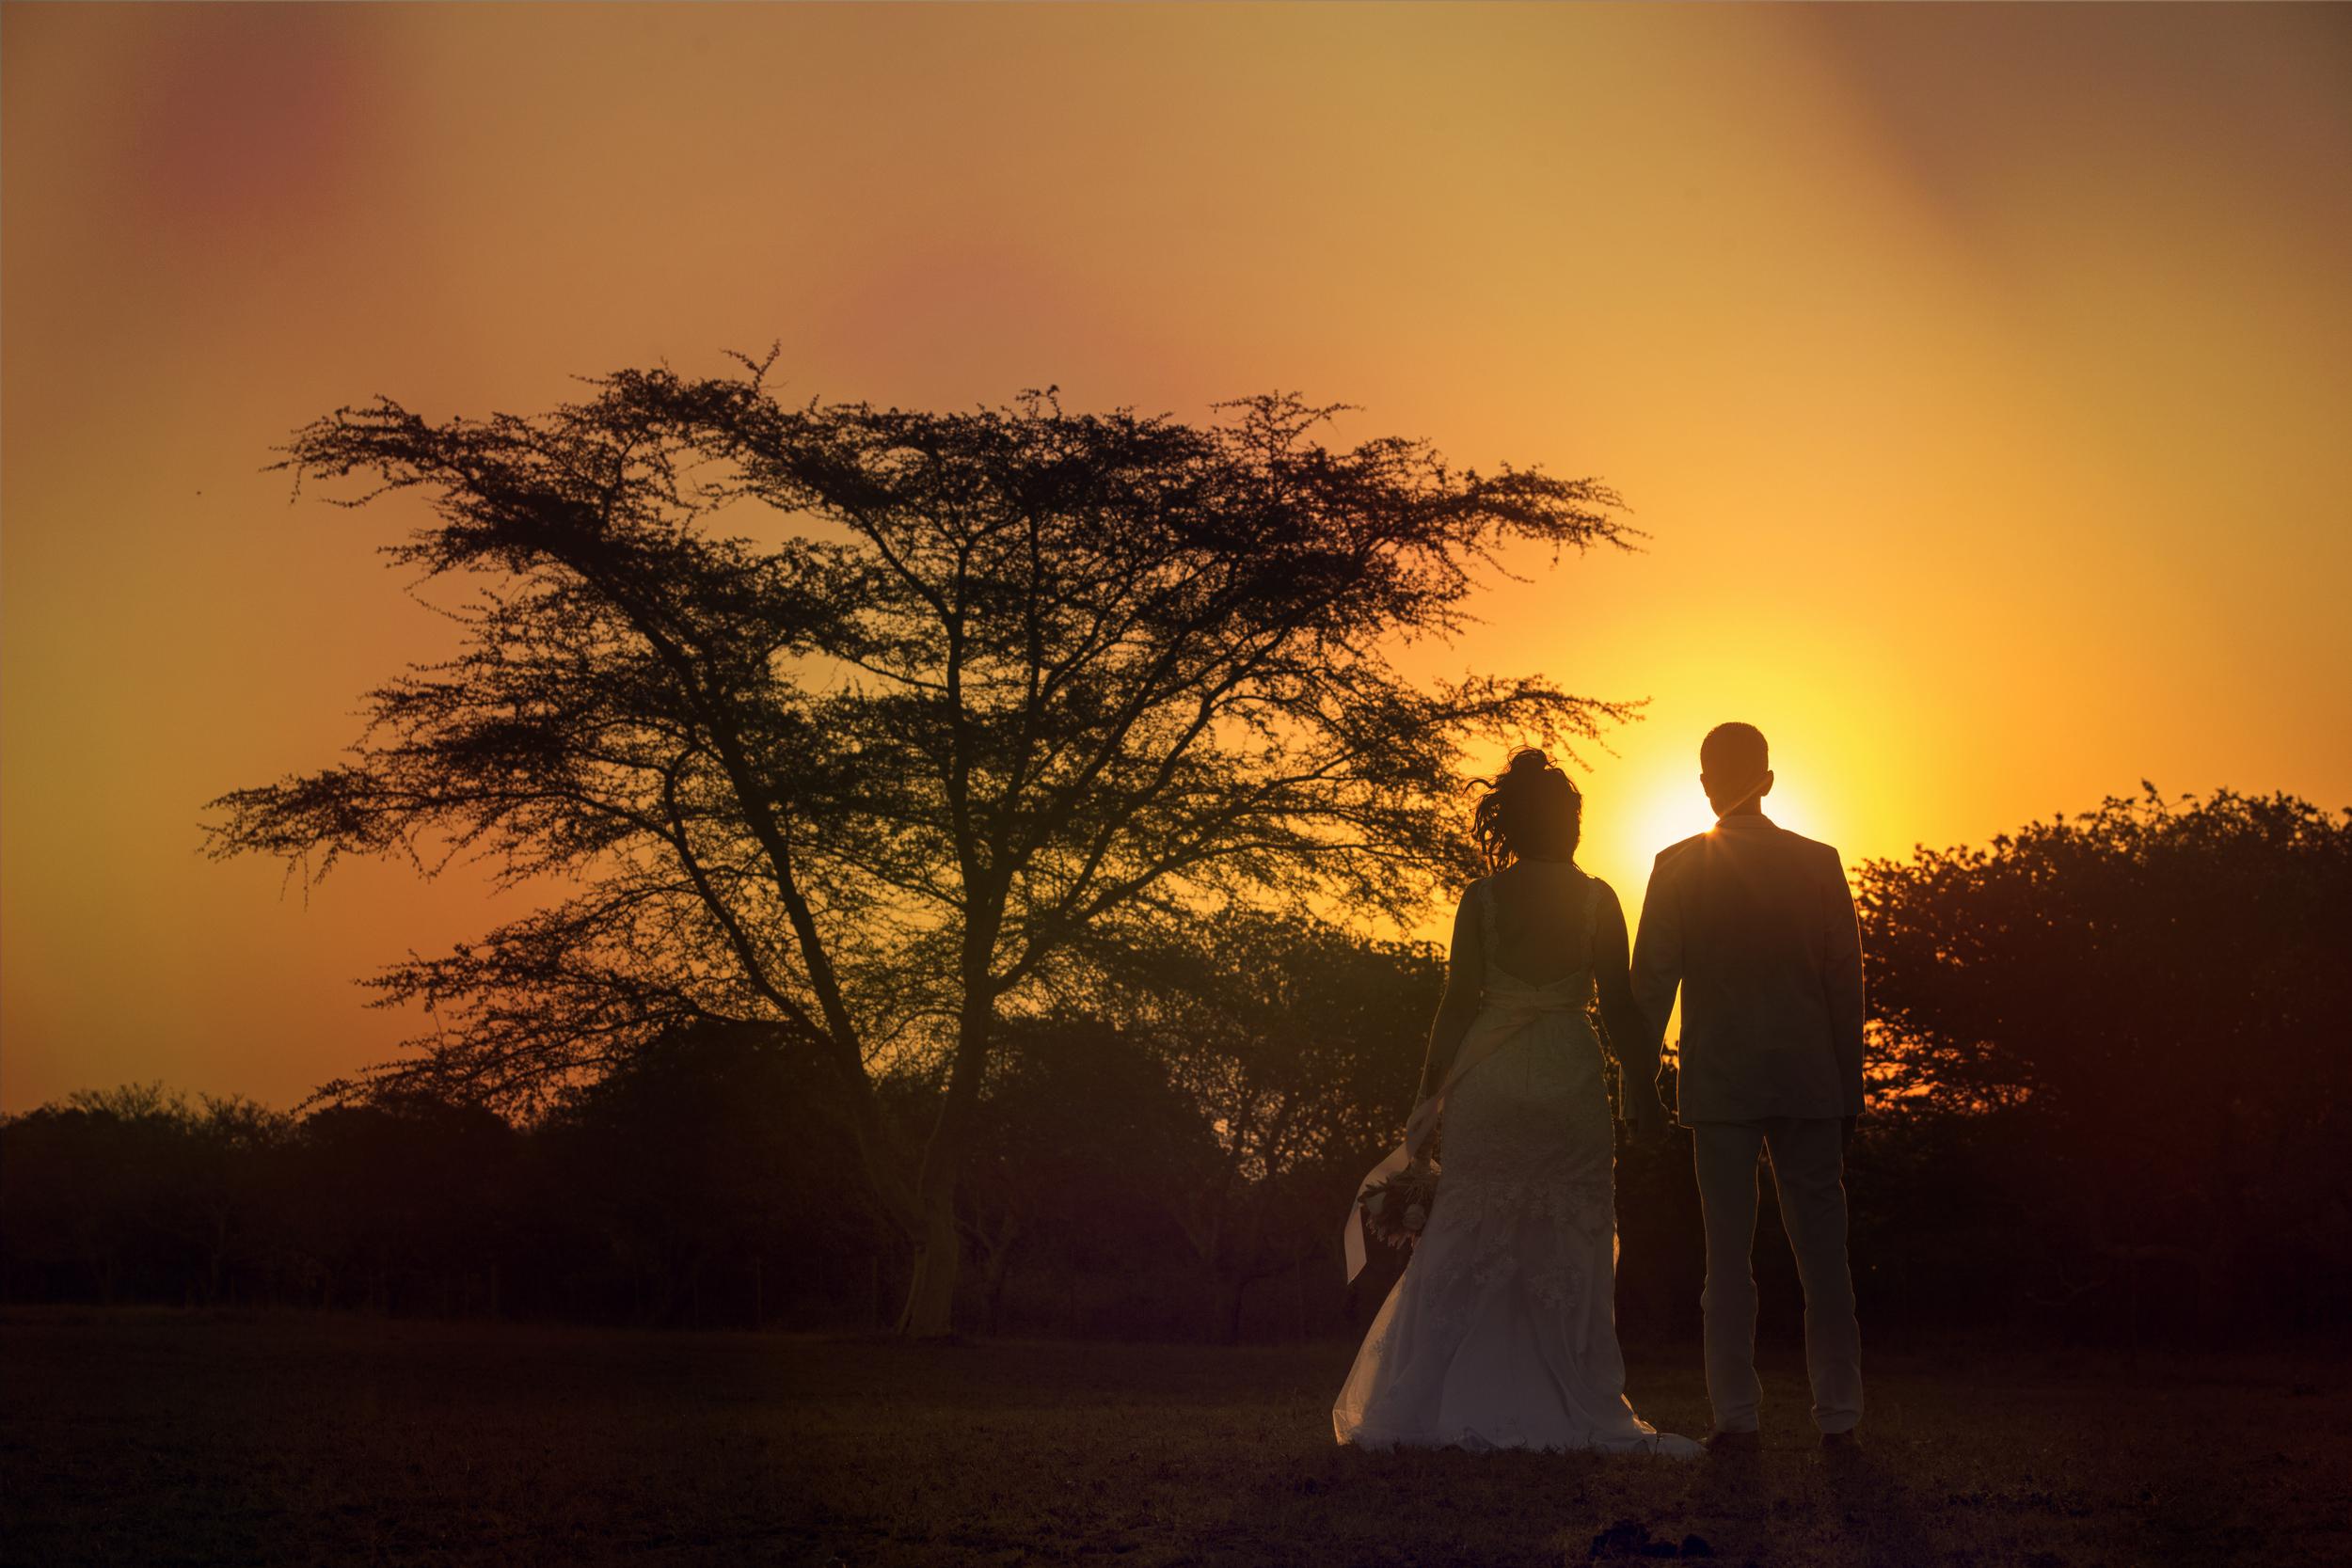 durban-wedding-photography-sunset.jpg